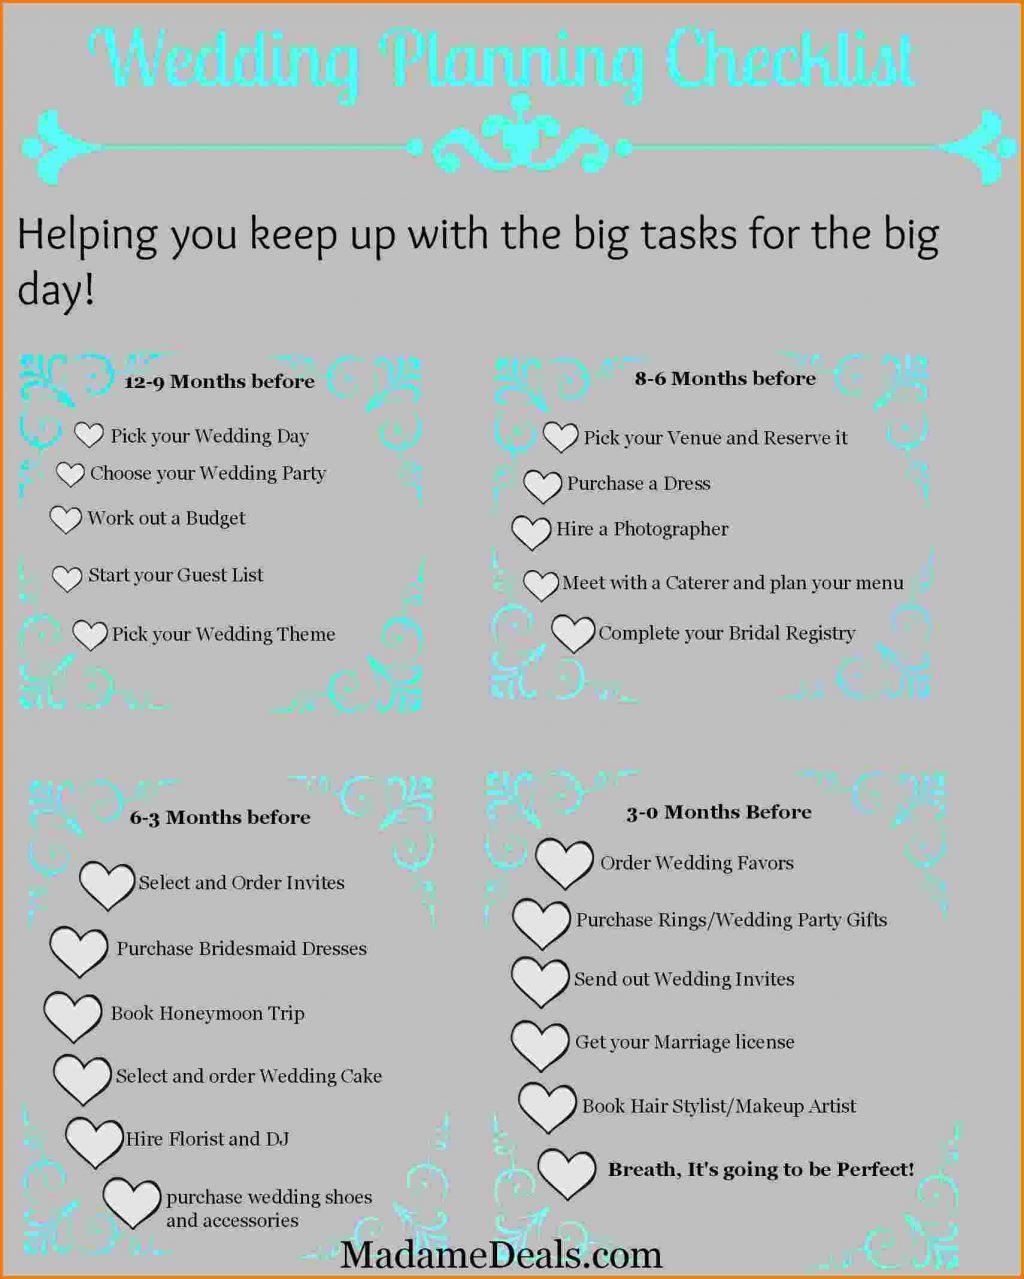 Complete Wedding Checklist Printable – Free Wedding Template - Free Printable Wedding Checklist